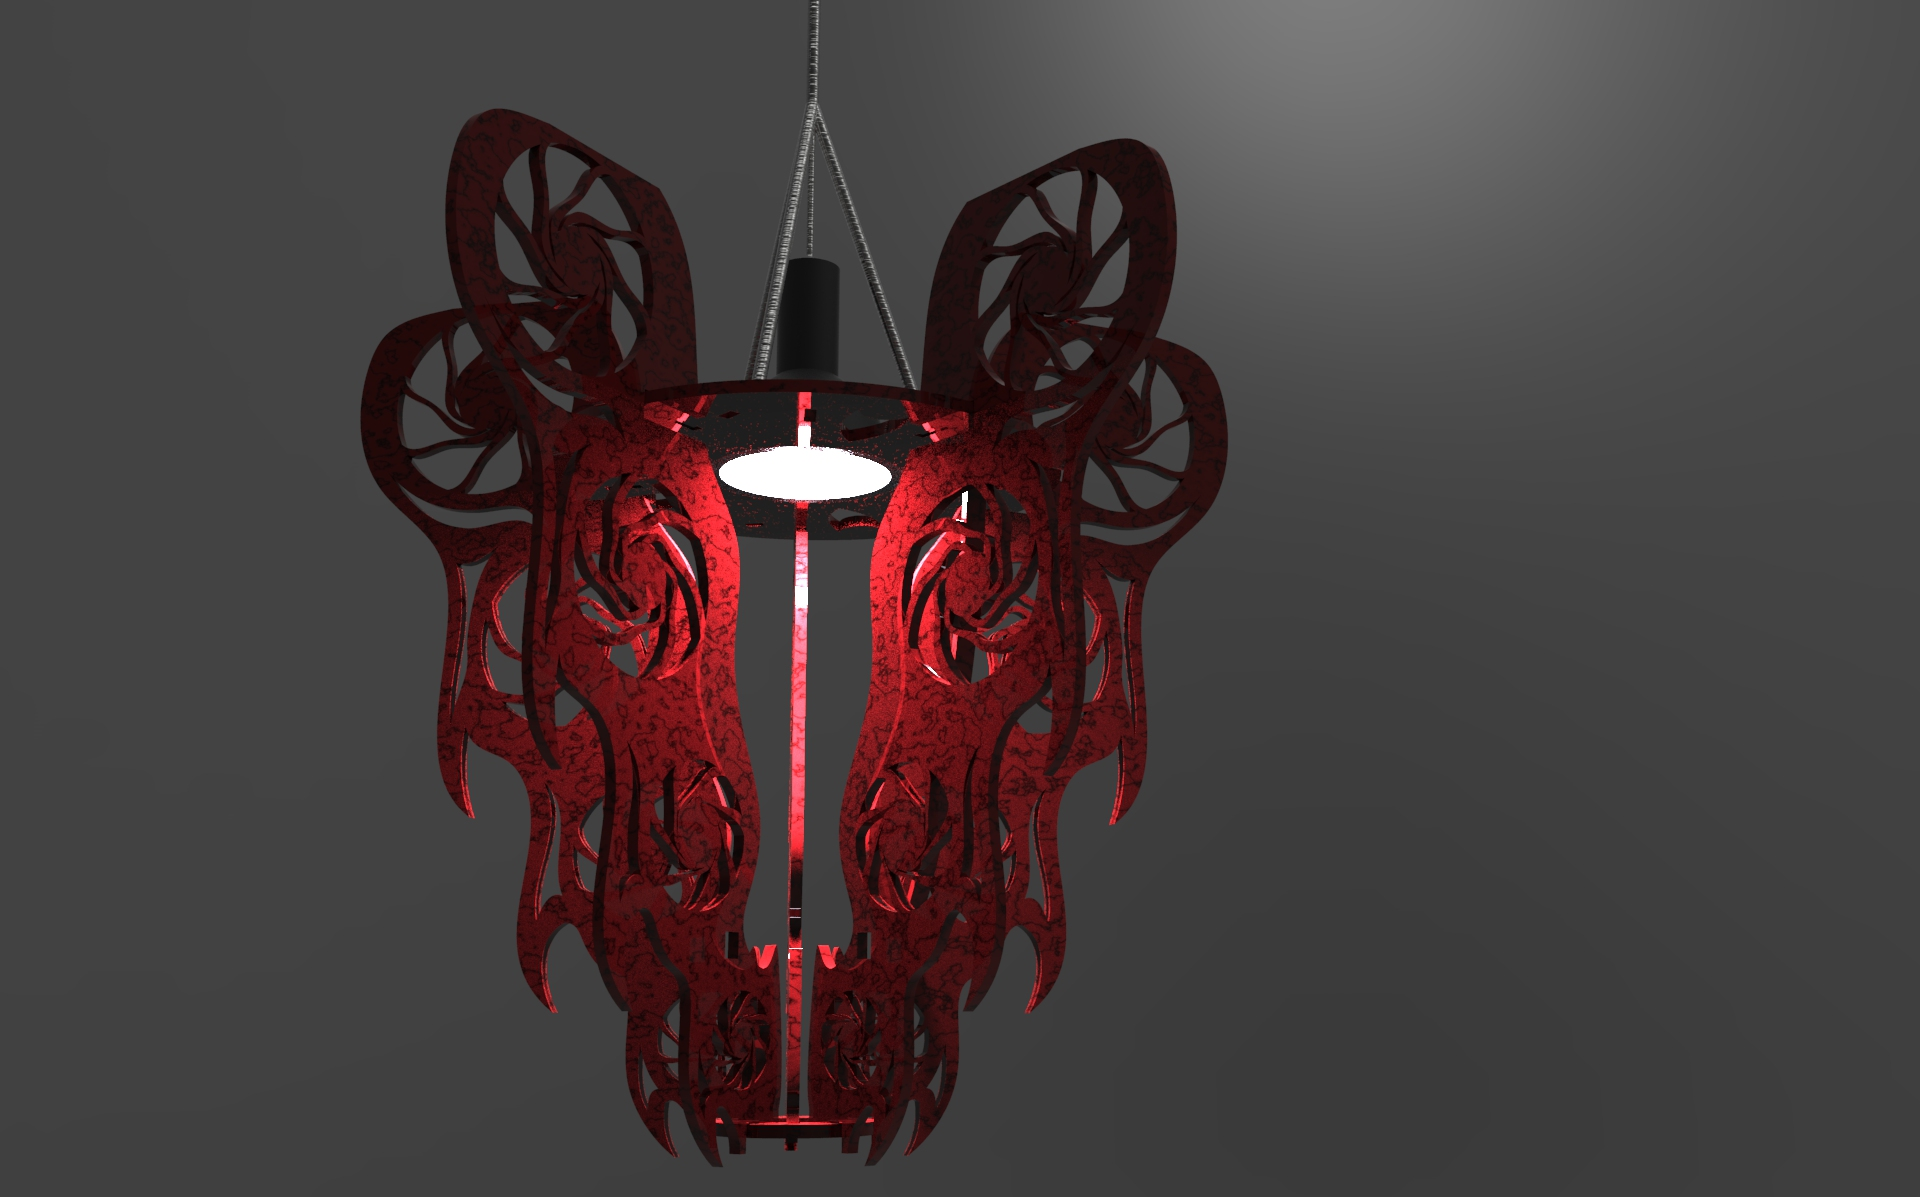 Final render red with black viens